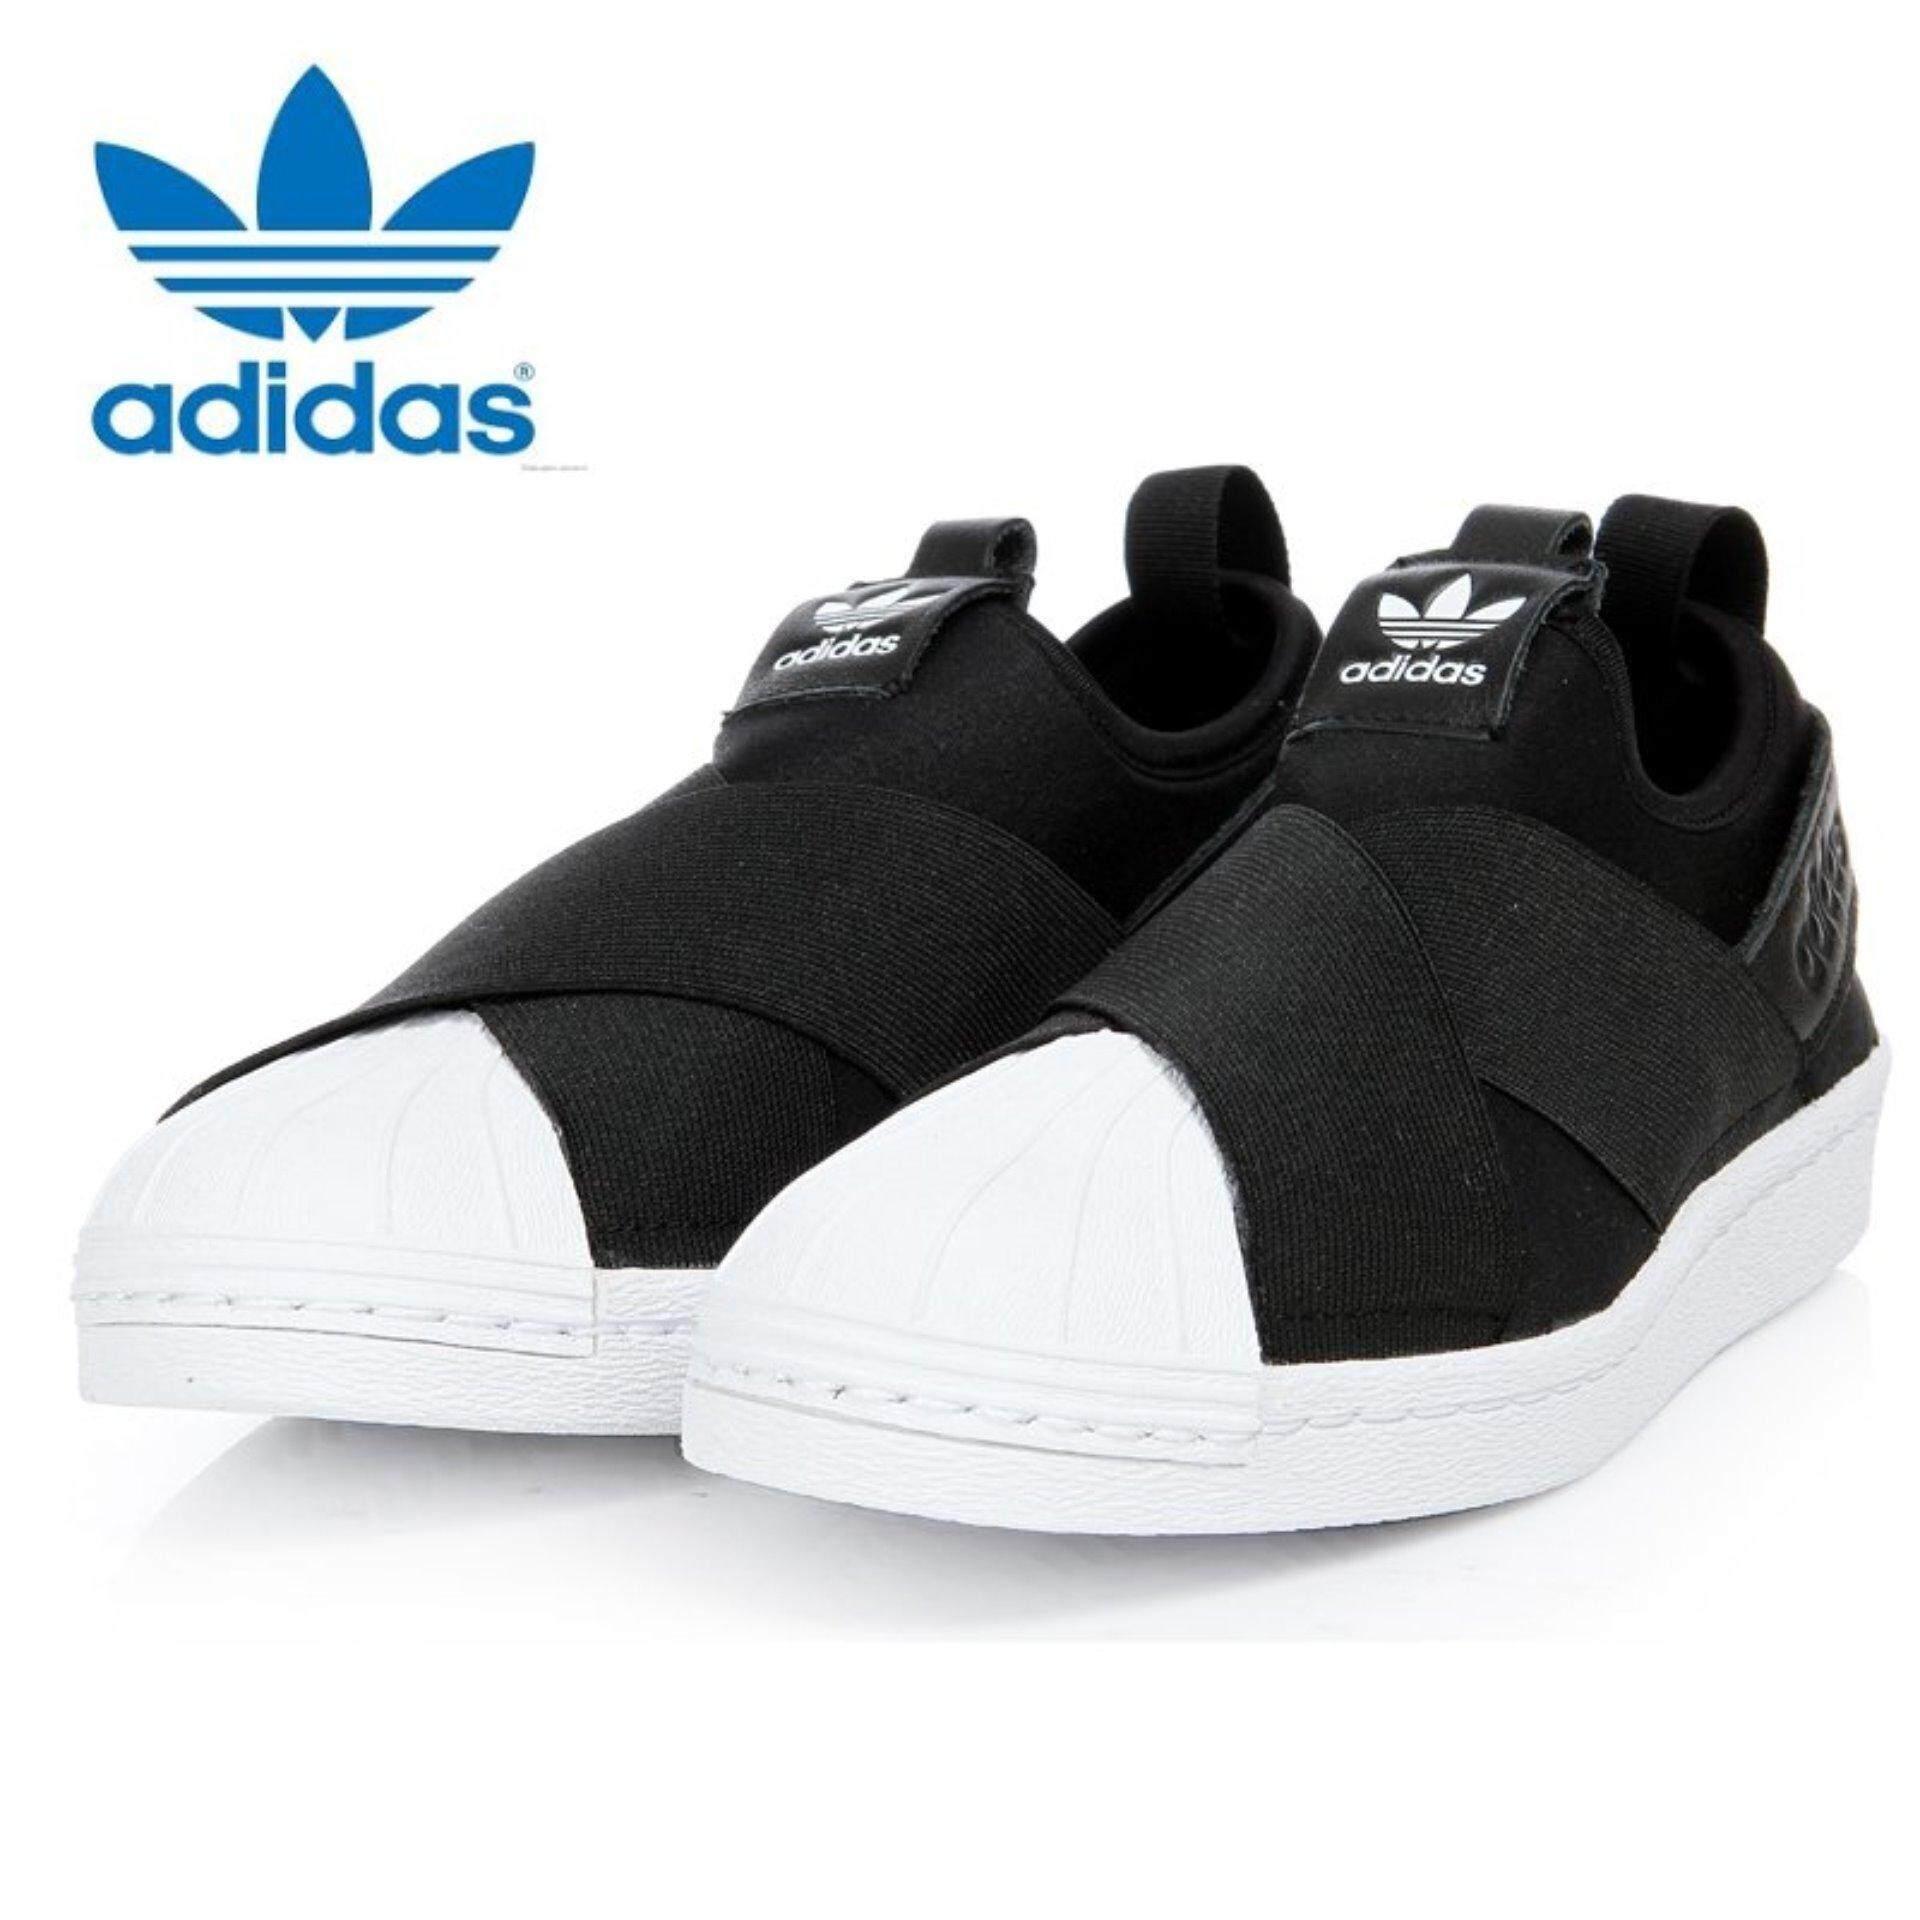 adidas shoes black. adidas originals superstar slip-on shoes s81337 black/white express   lazada malaysia black